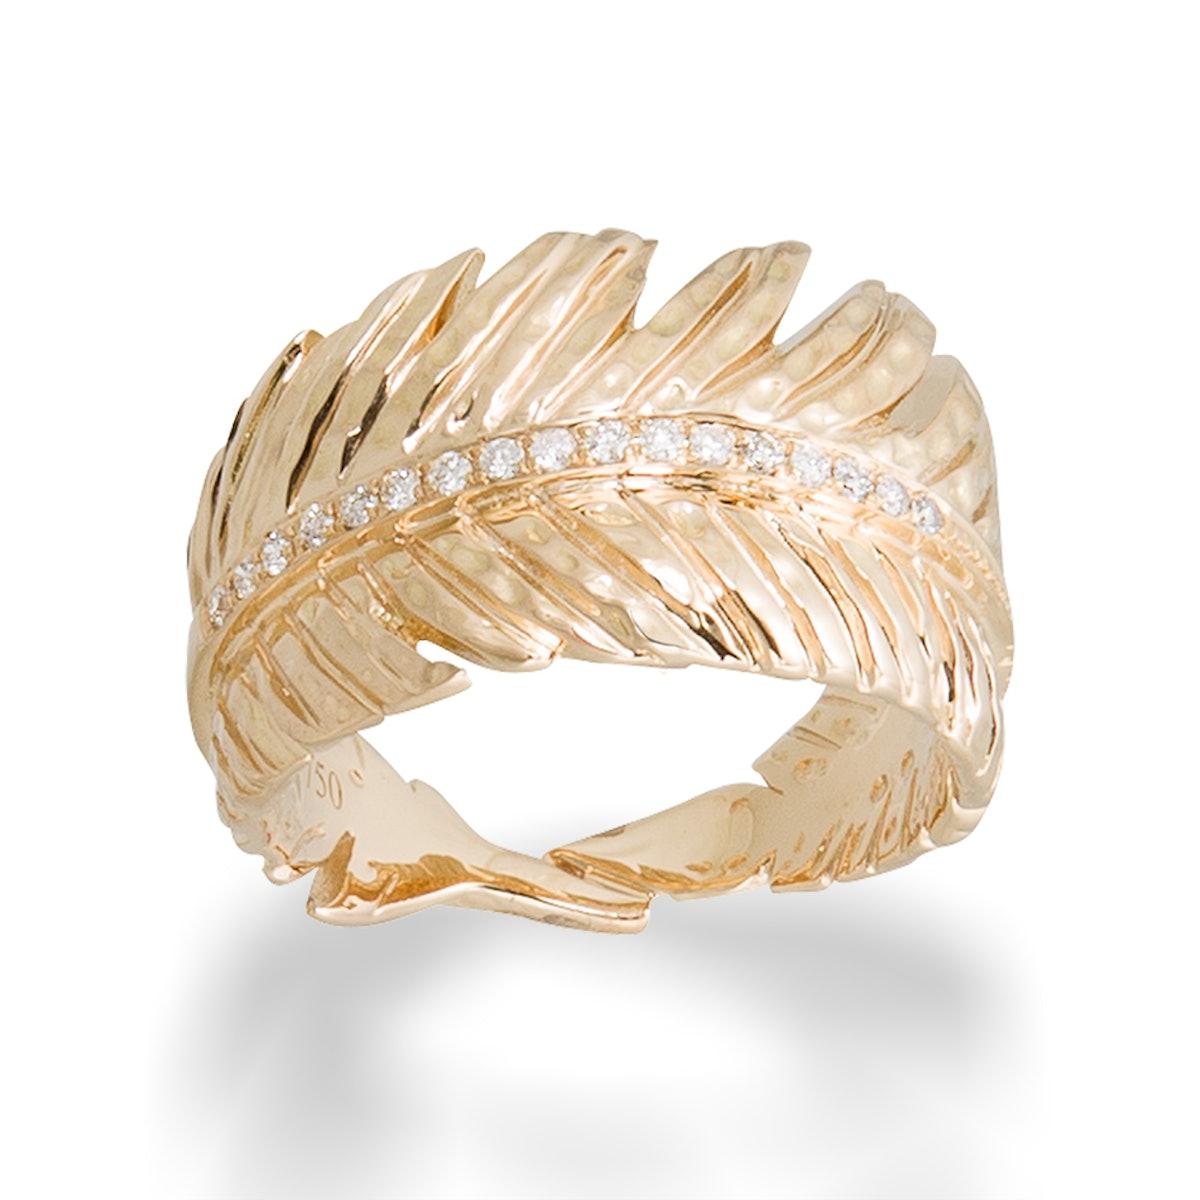 Michael Aram gold and diamond ring